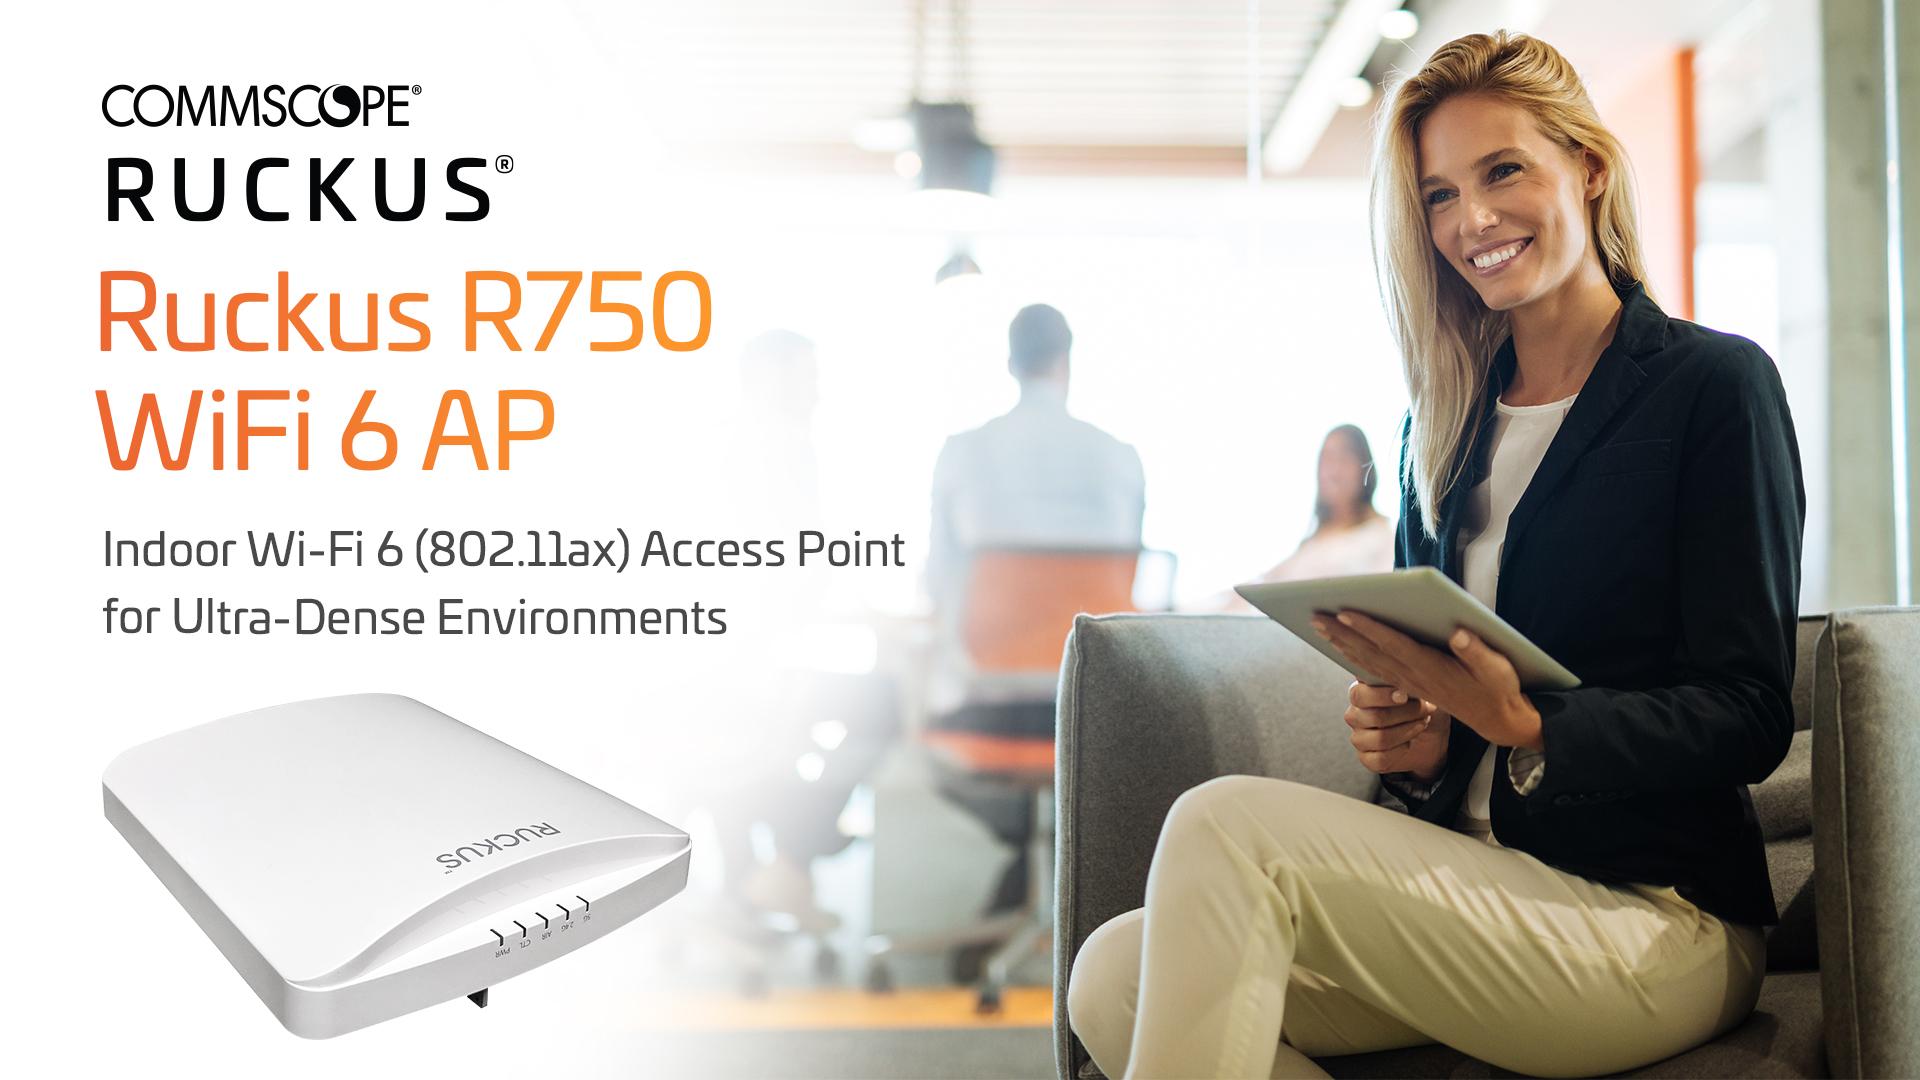 Ruckus R750 WiFi 6 AP